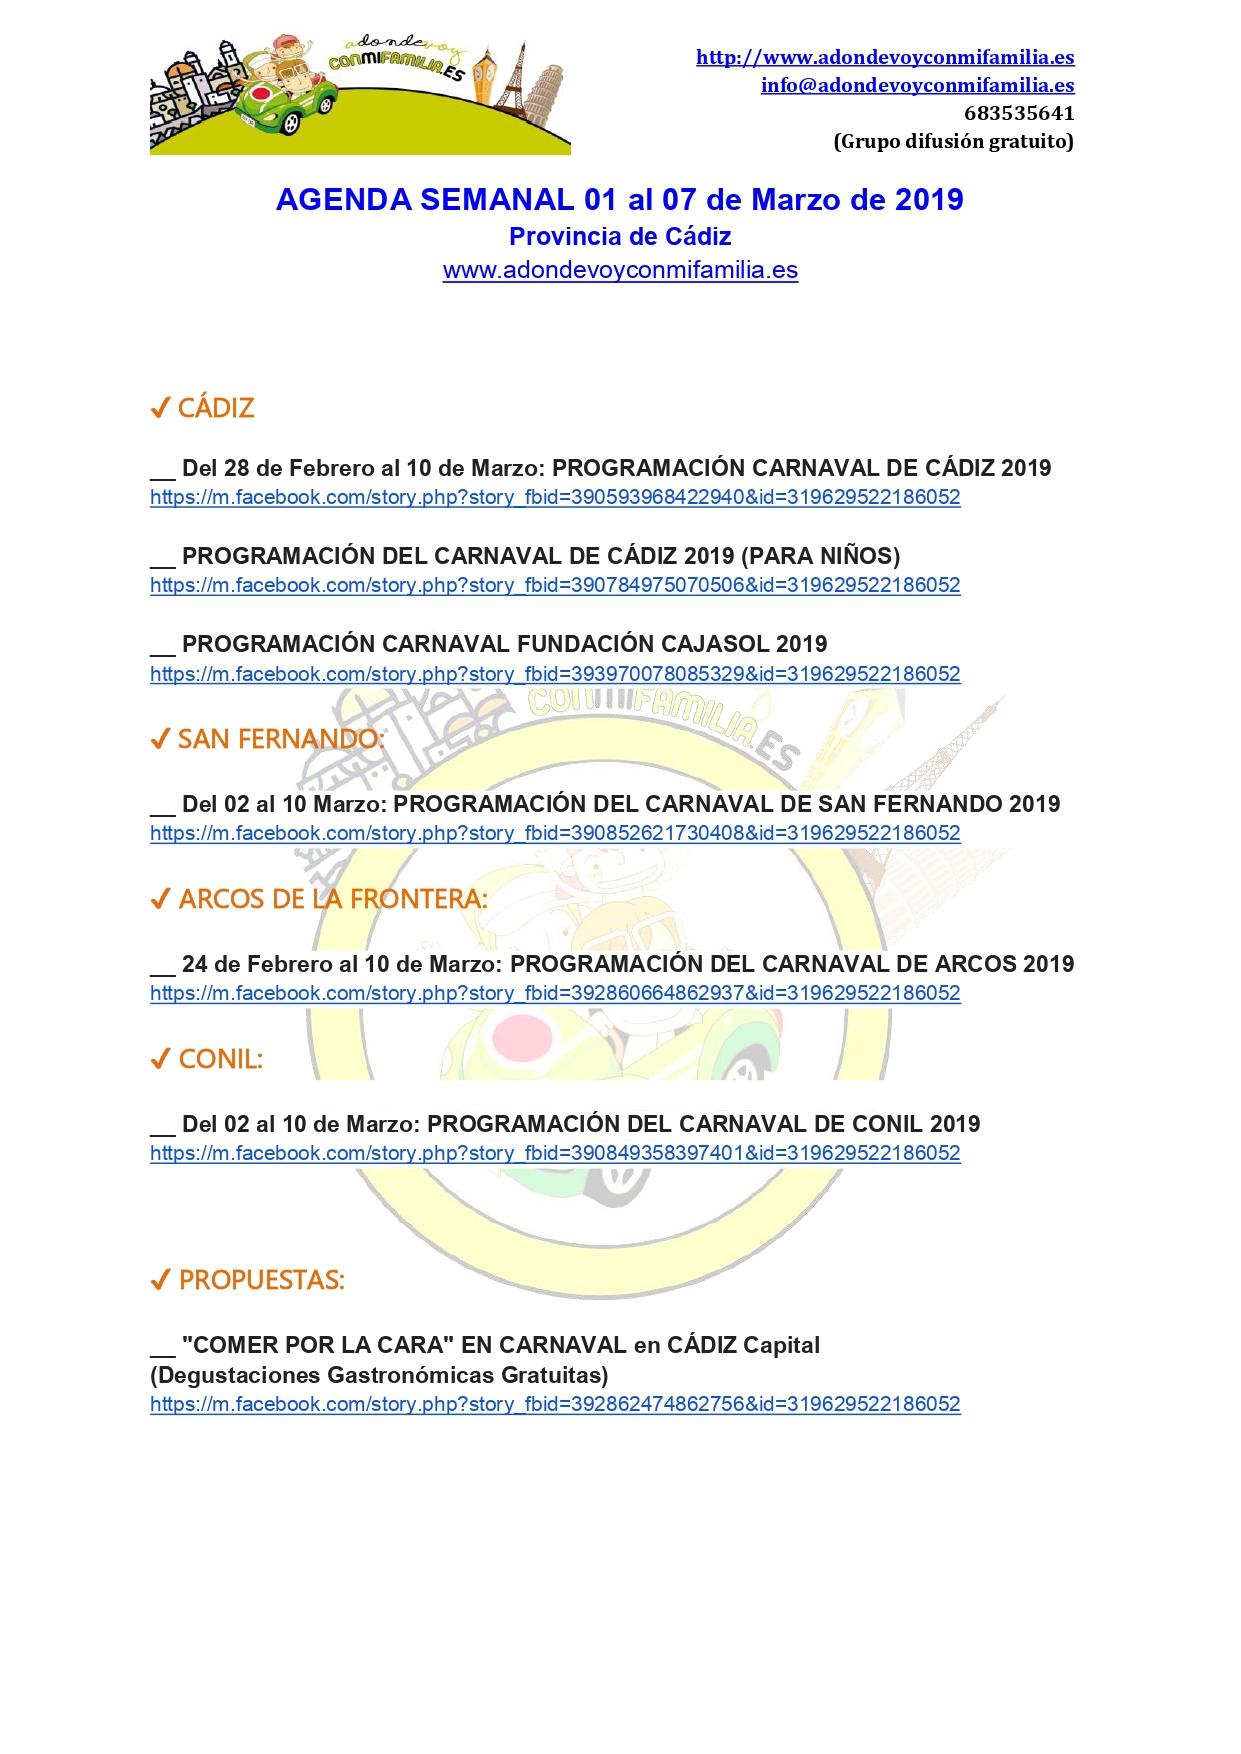 Agenda semanal 01 al 07 marzo 2019 provincia cadiz adondevoyconmifamilia